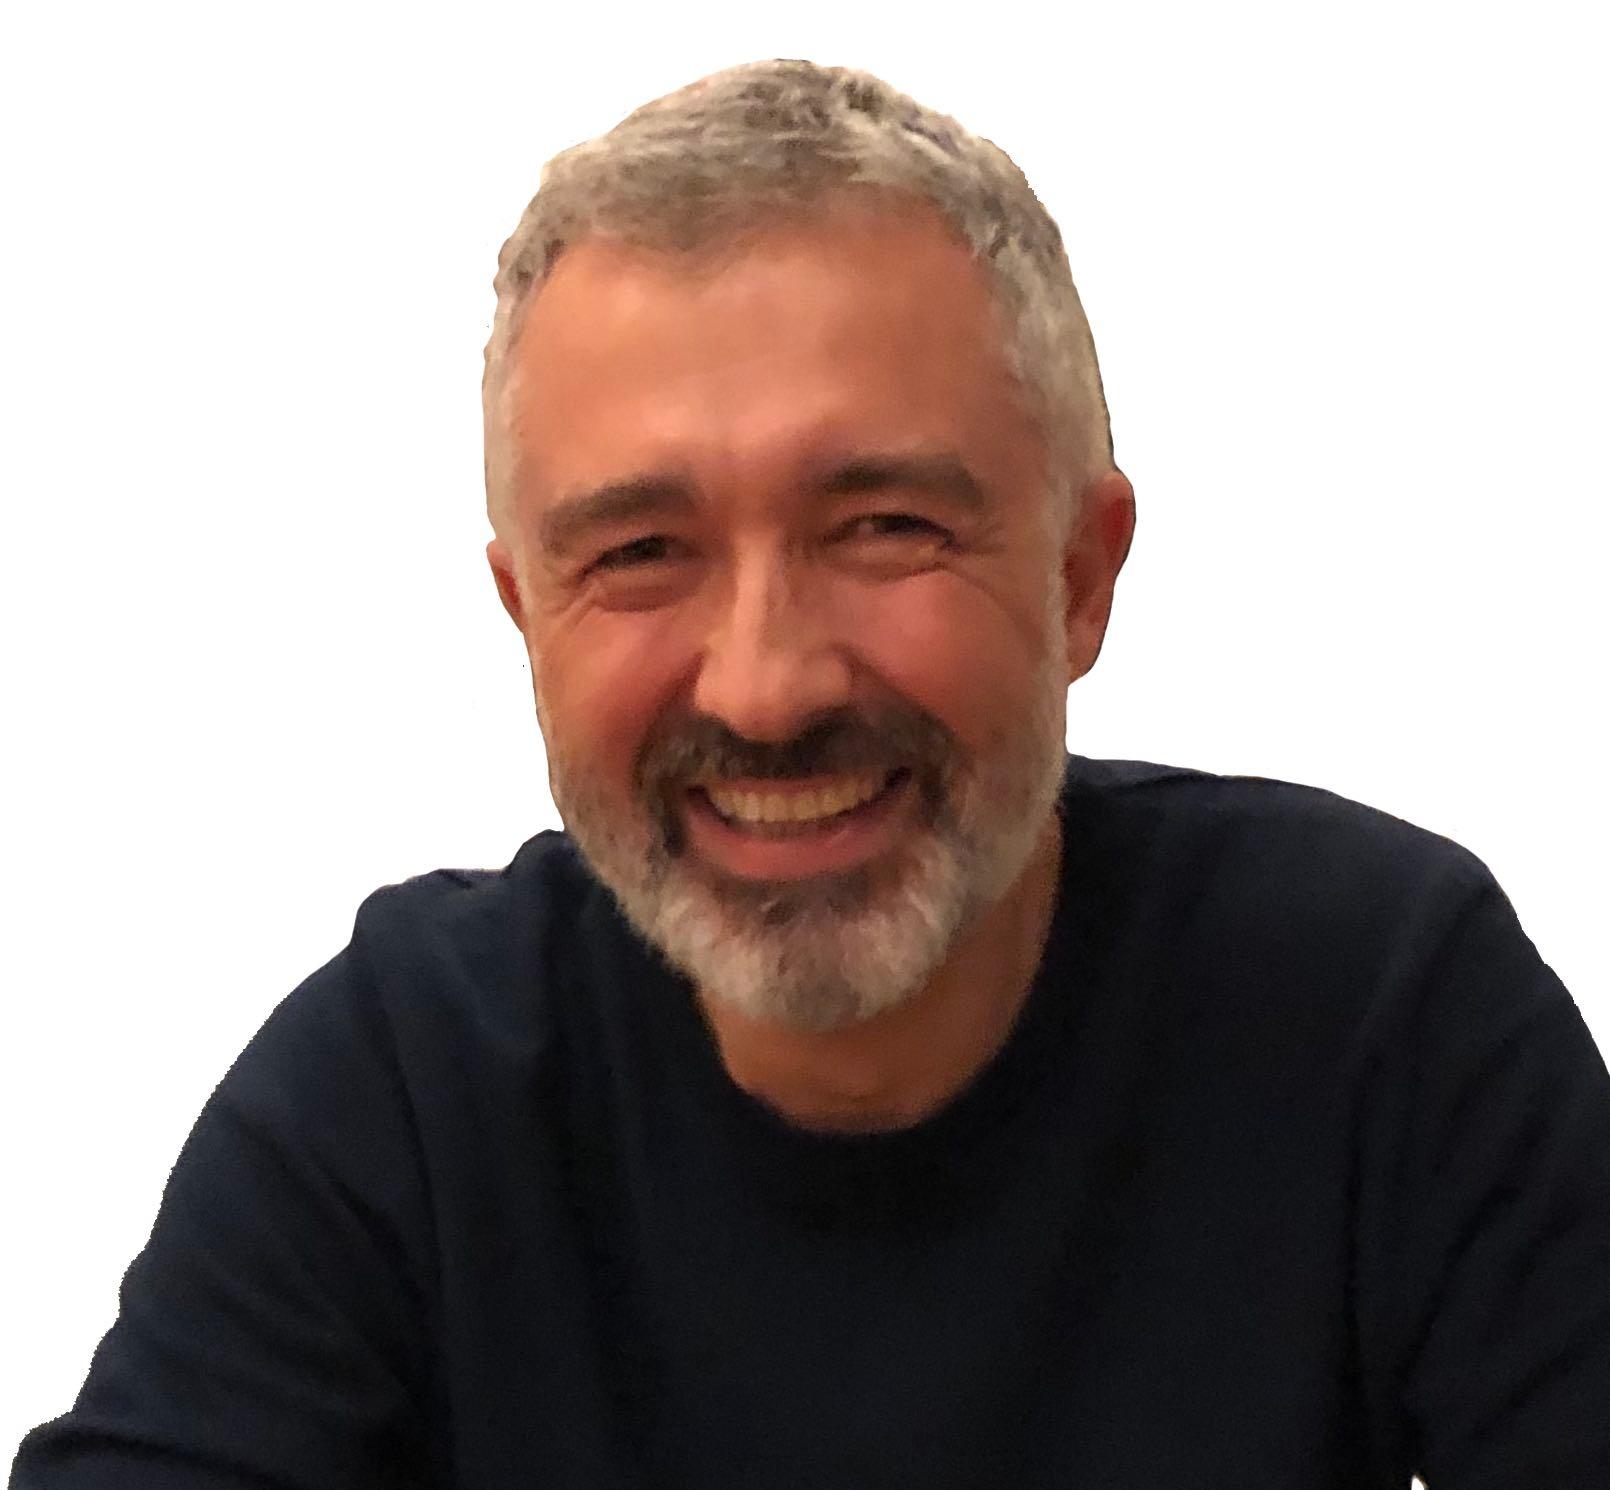 Agostino Marengo